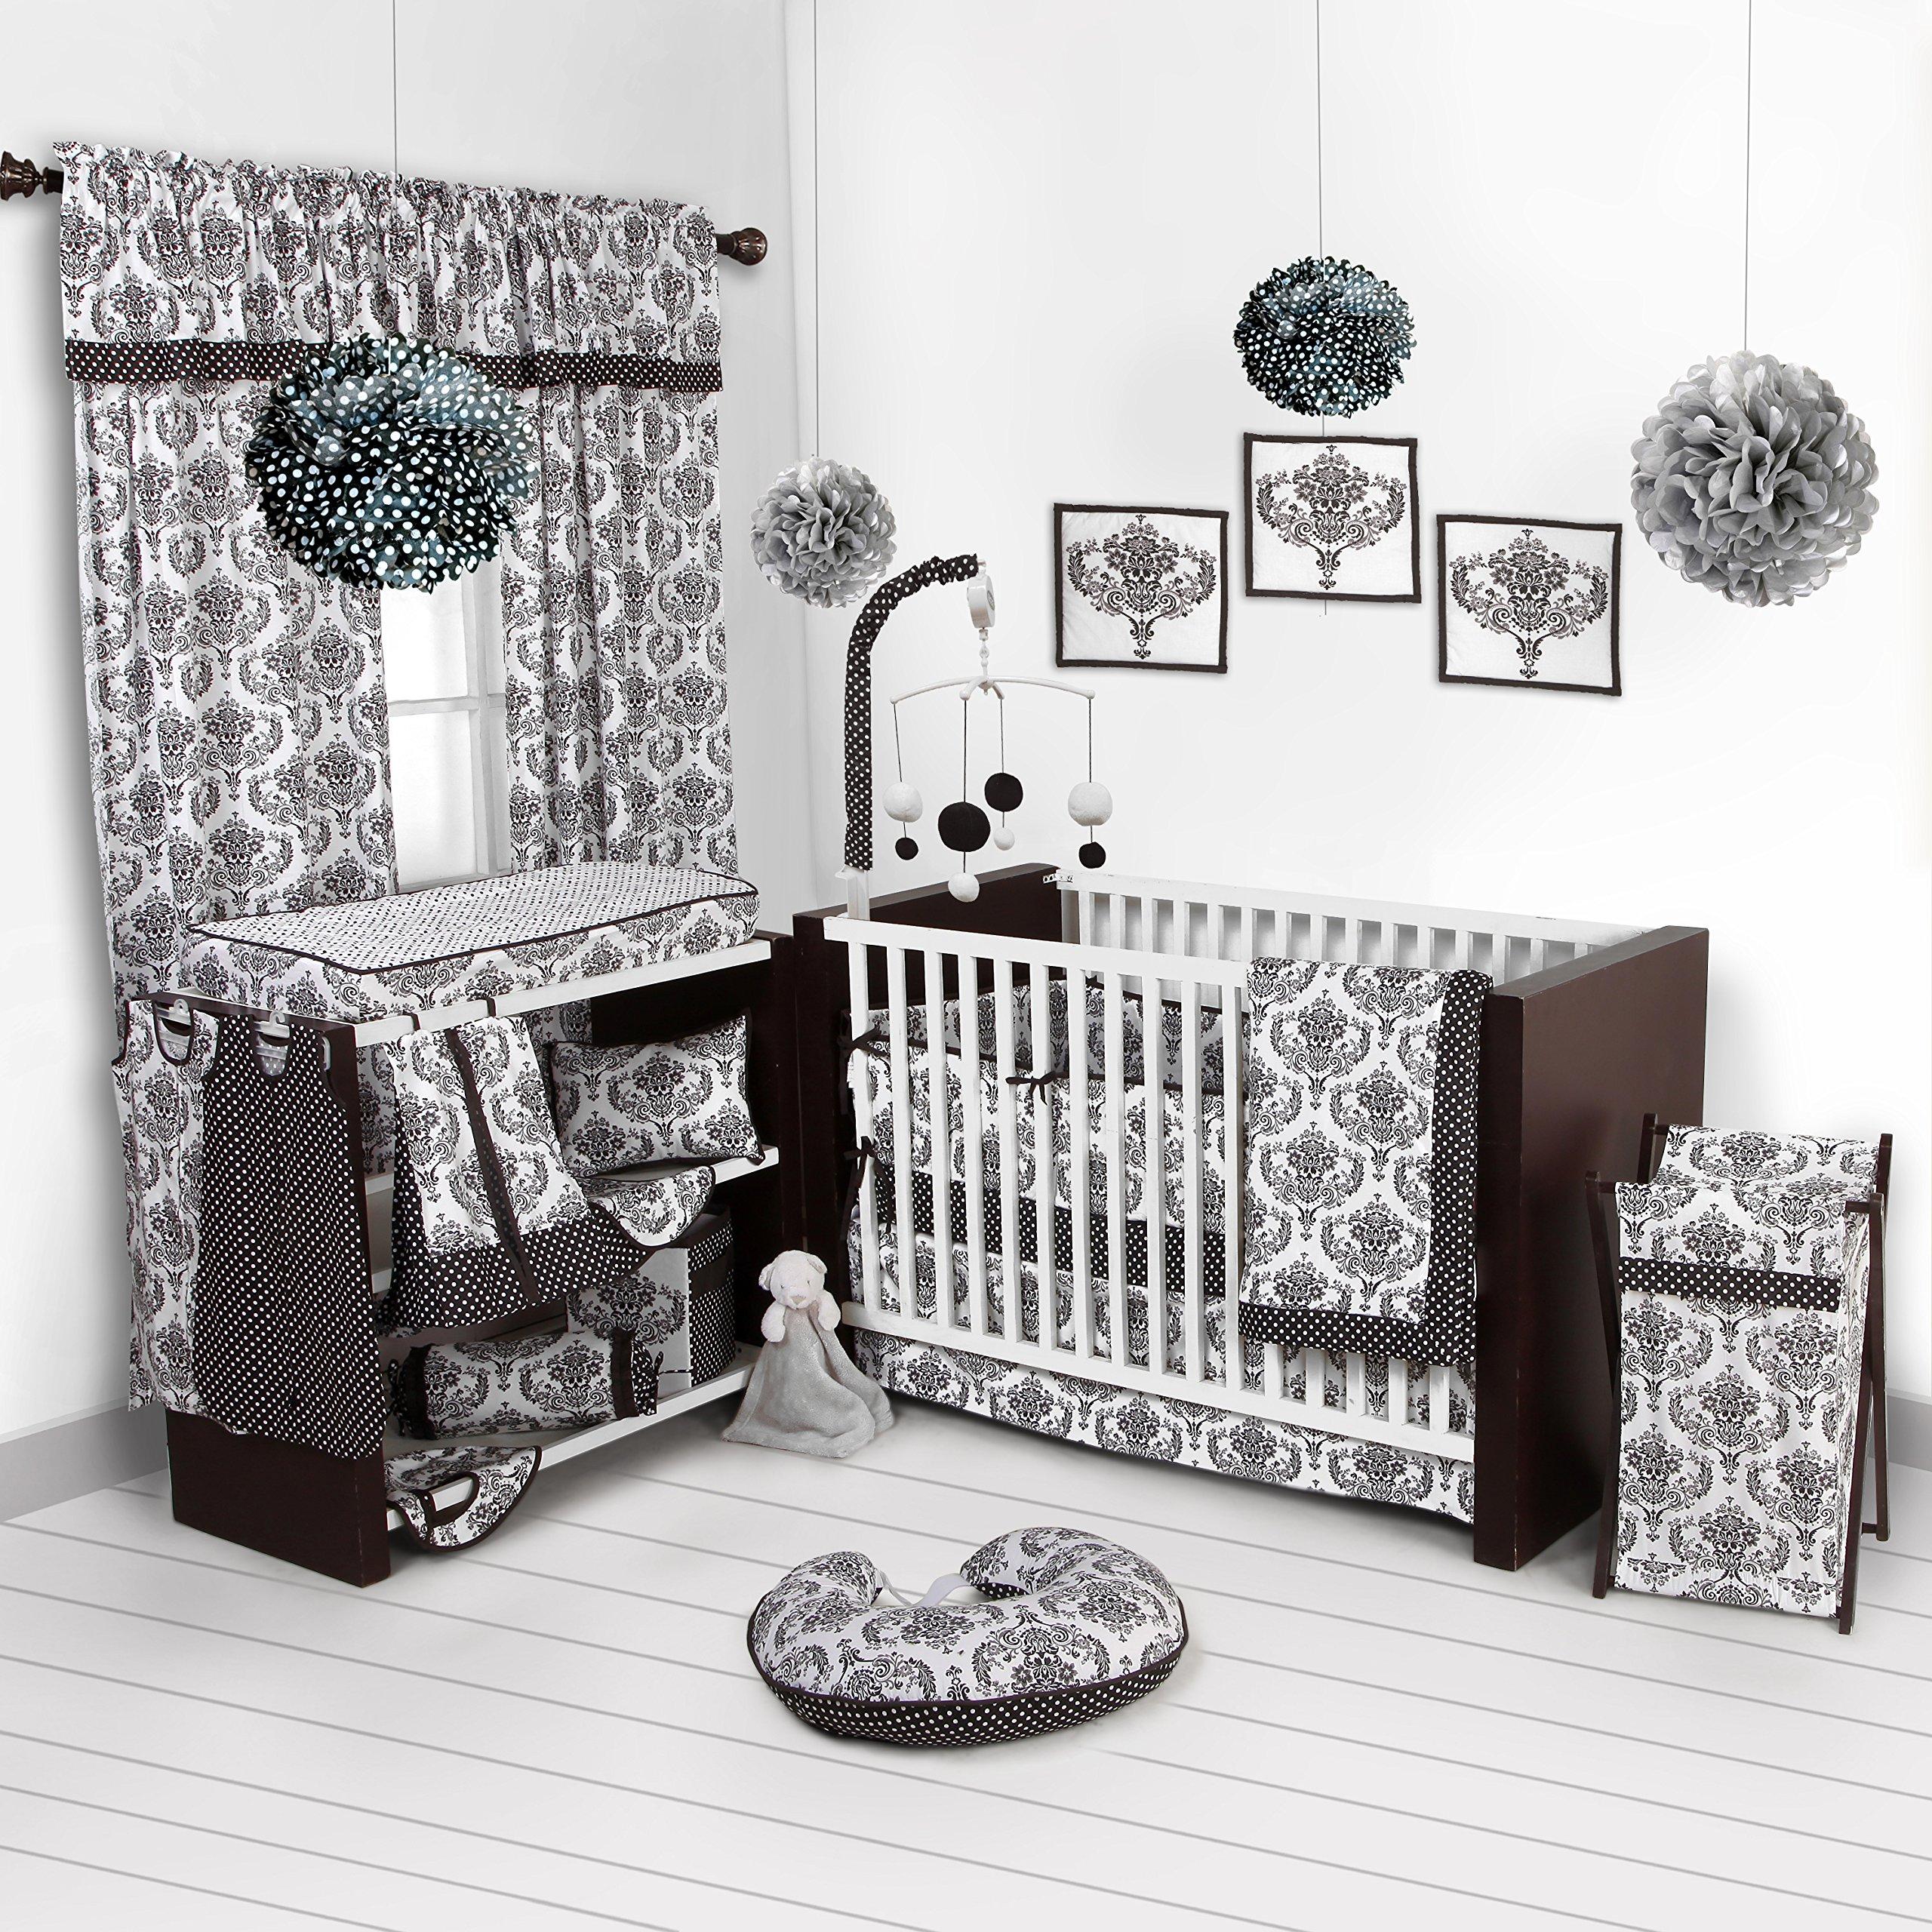 Bacati - Classic Damask White/black 10 Pc Crib Set Including Bumper Pad by Bacati